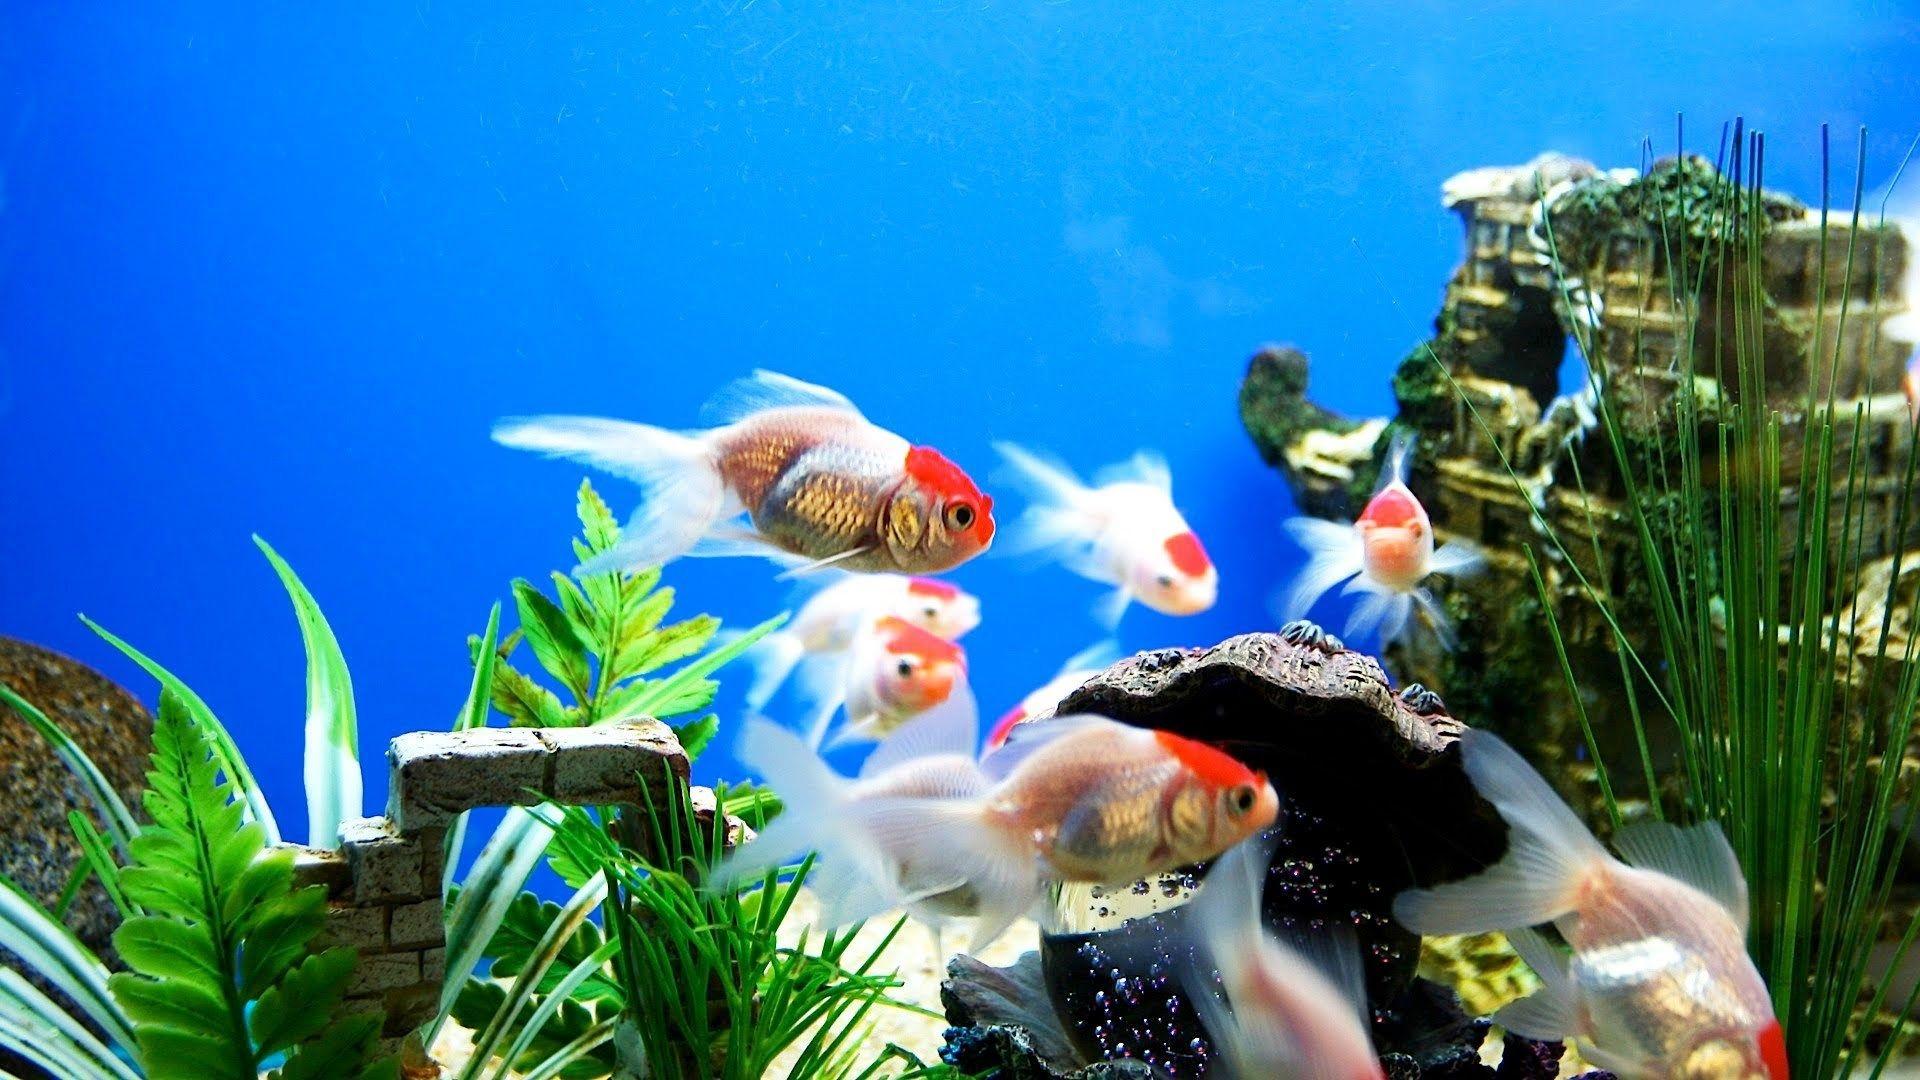 Fish High Quality Wallpapers Hd Home Aquarium Fish Aquarium Fish Aquarium